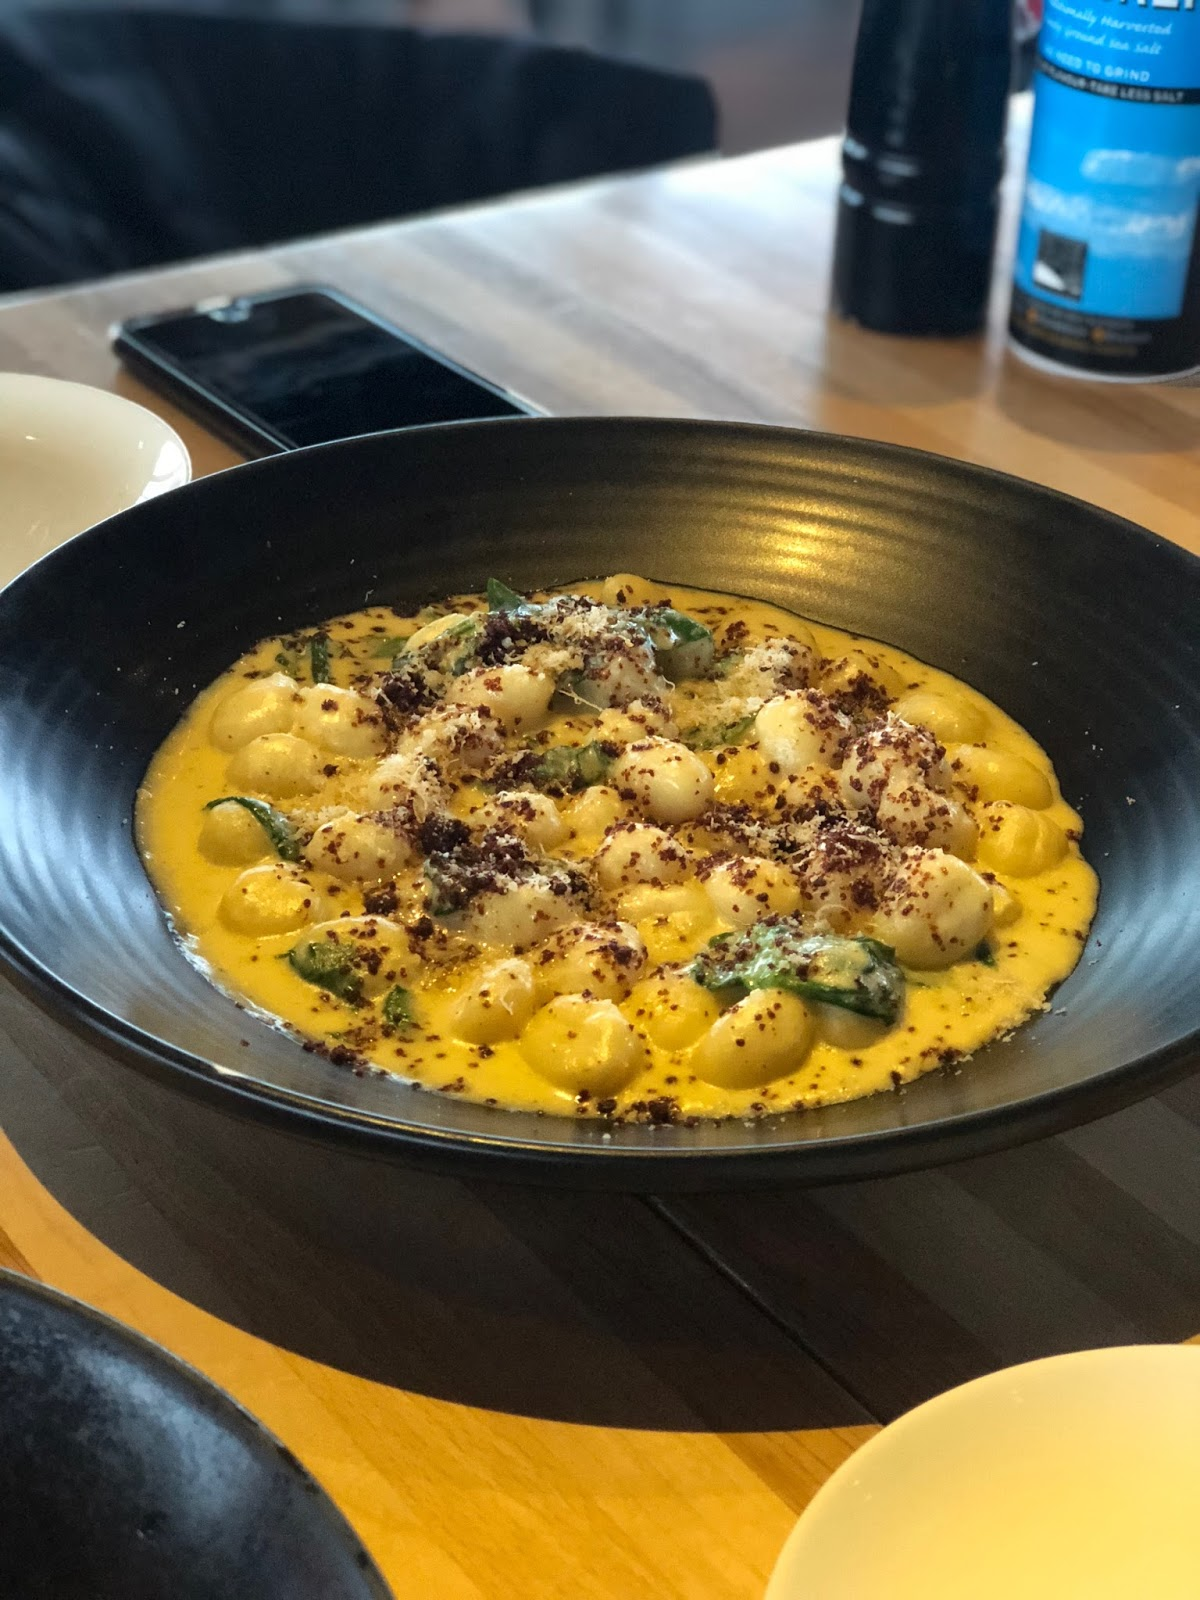 Where to eat in dubin, places to dine in dublin, pizza in dublin, Italian restaurant dublin